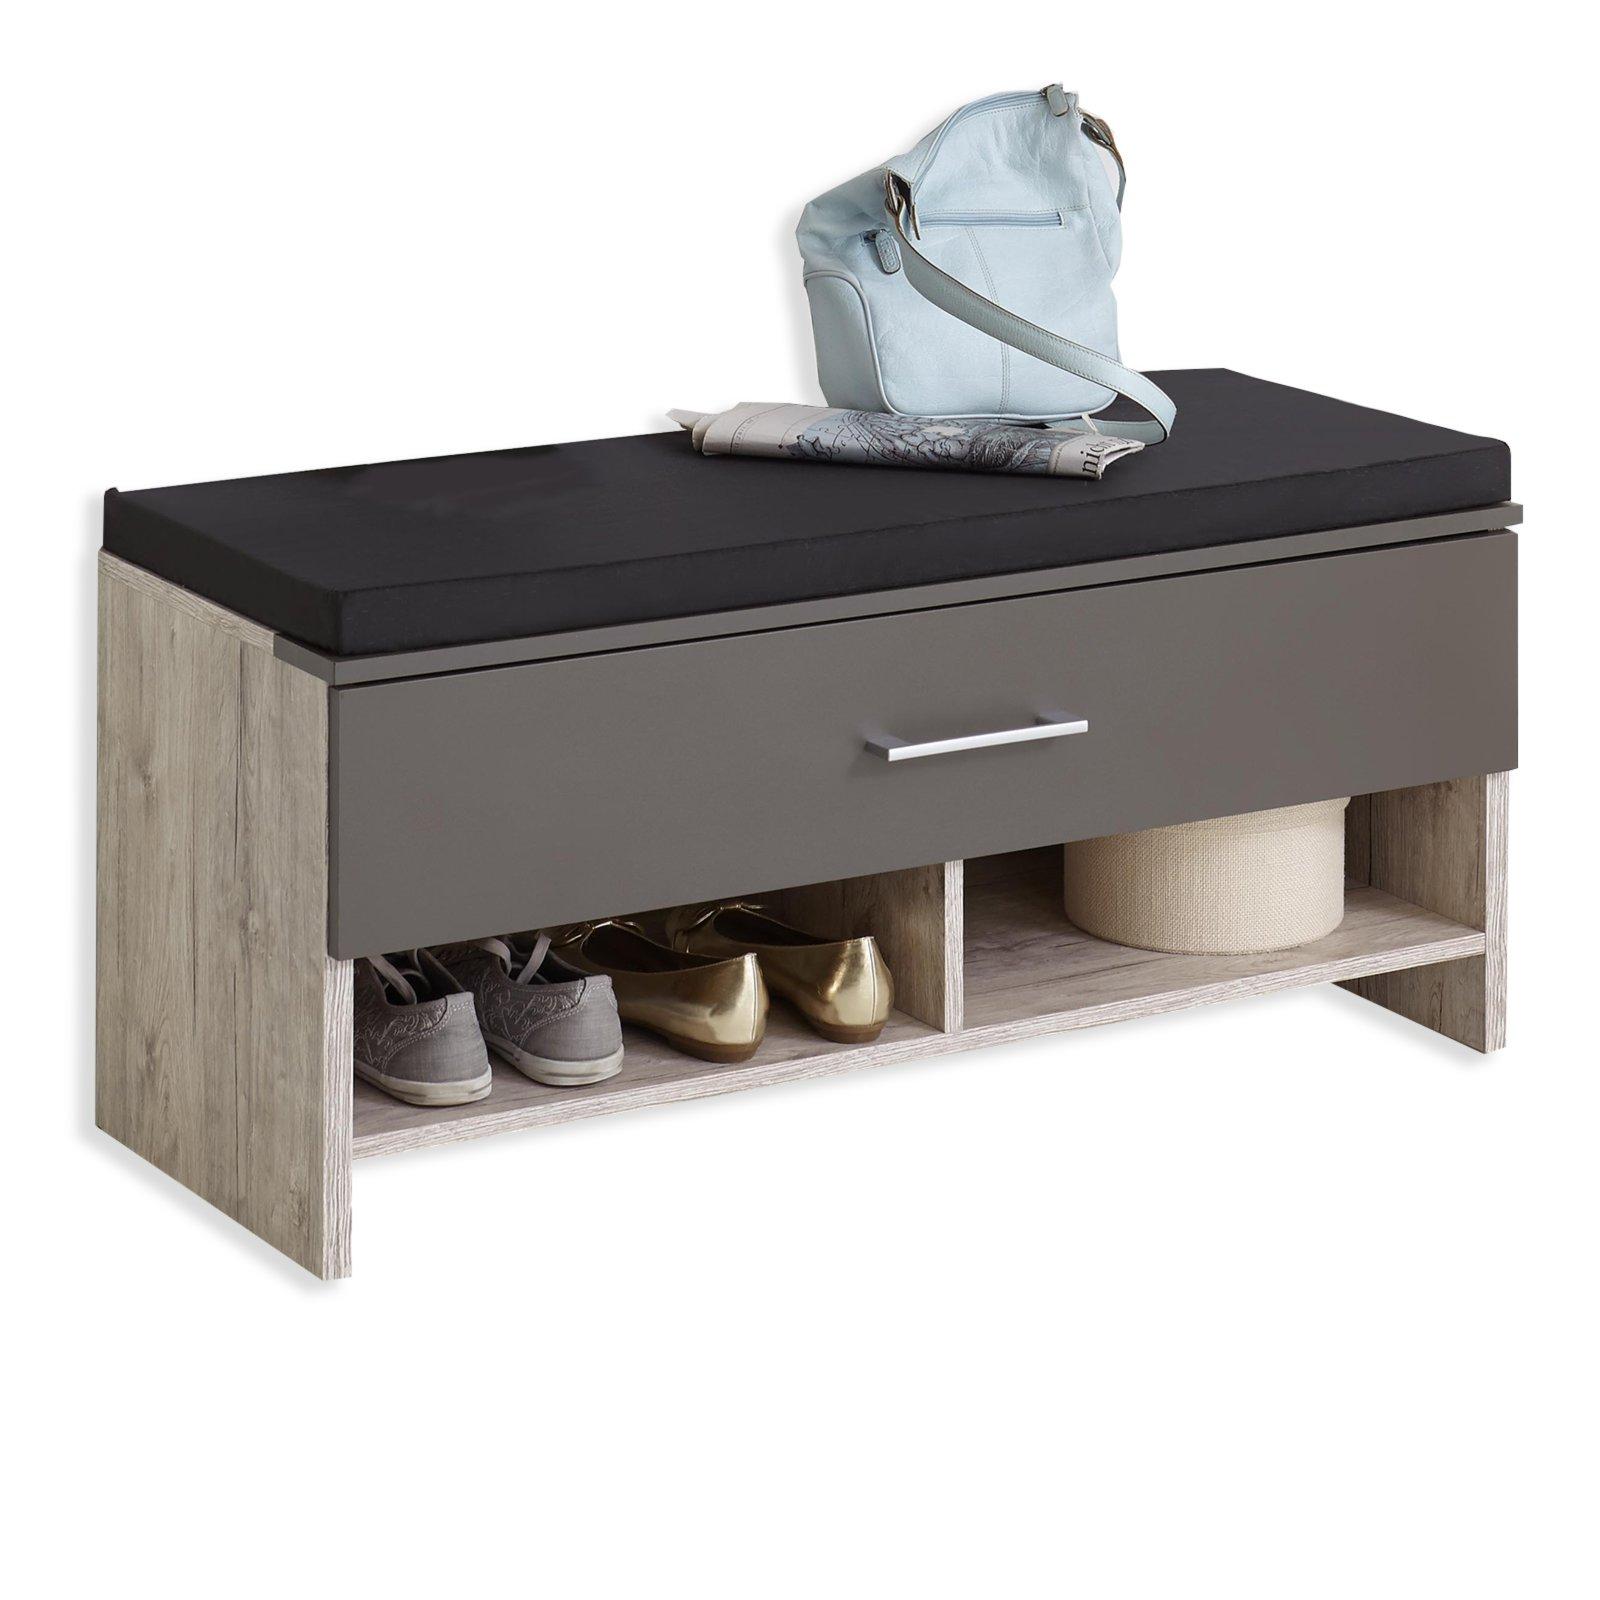 schuhbank alan sandeiche lava 100 cm nachbildung ebay. Black Bedroom Furniture Sets. Home Design Ideas